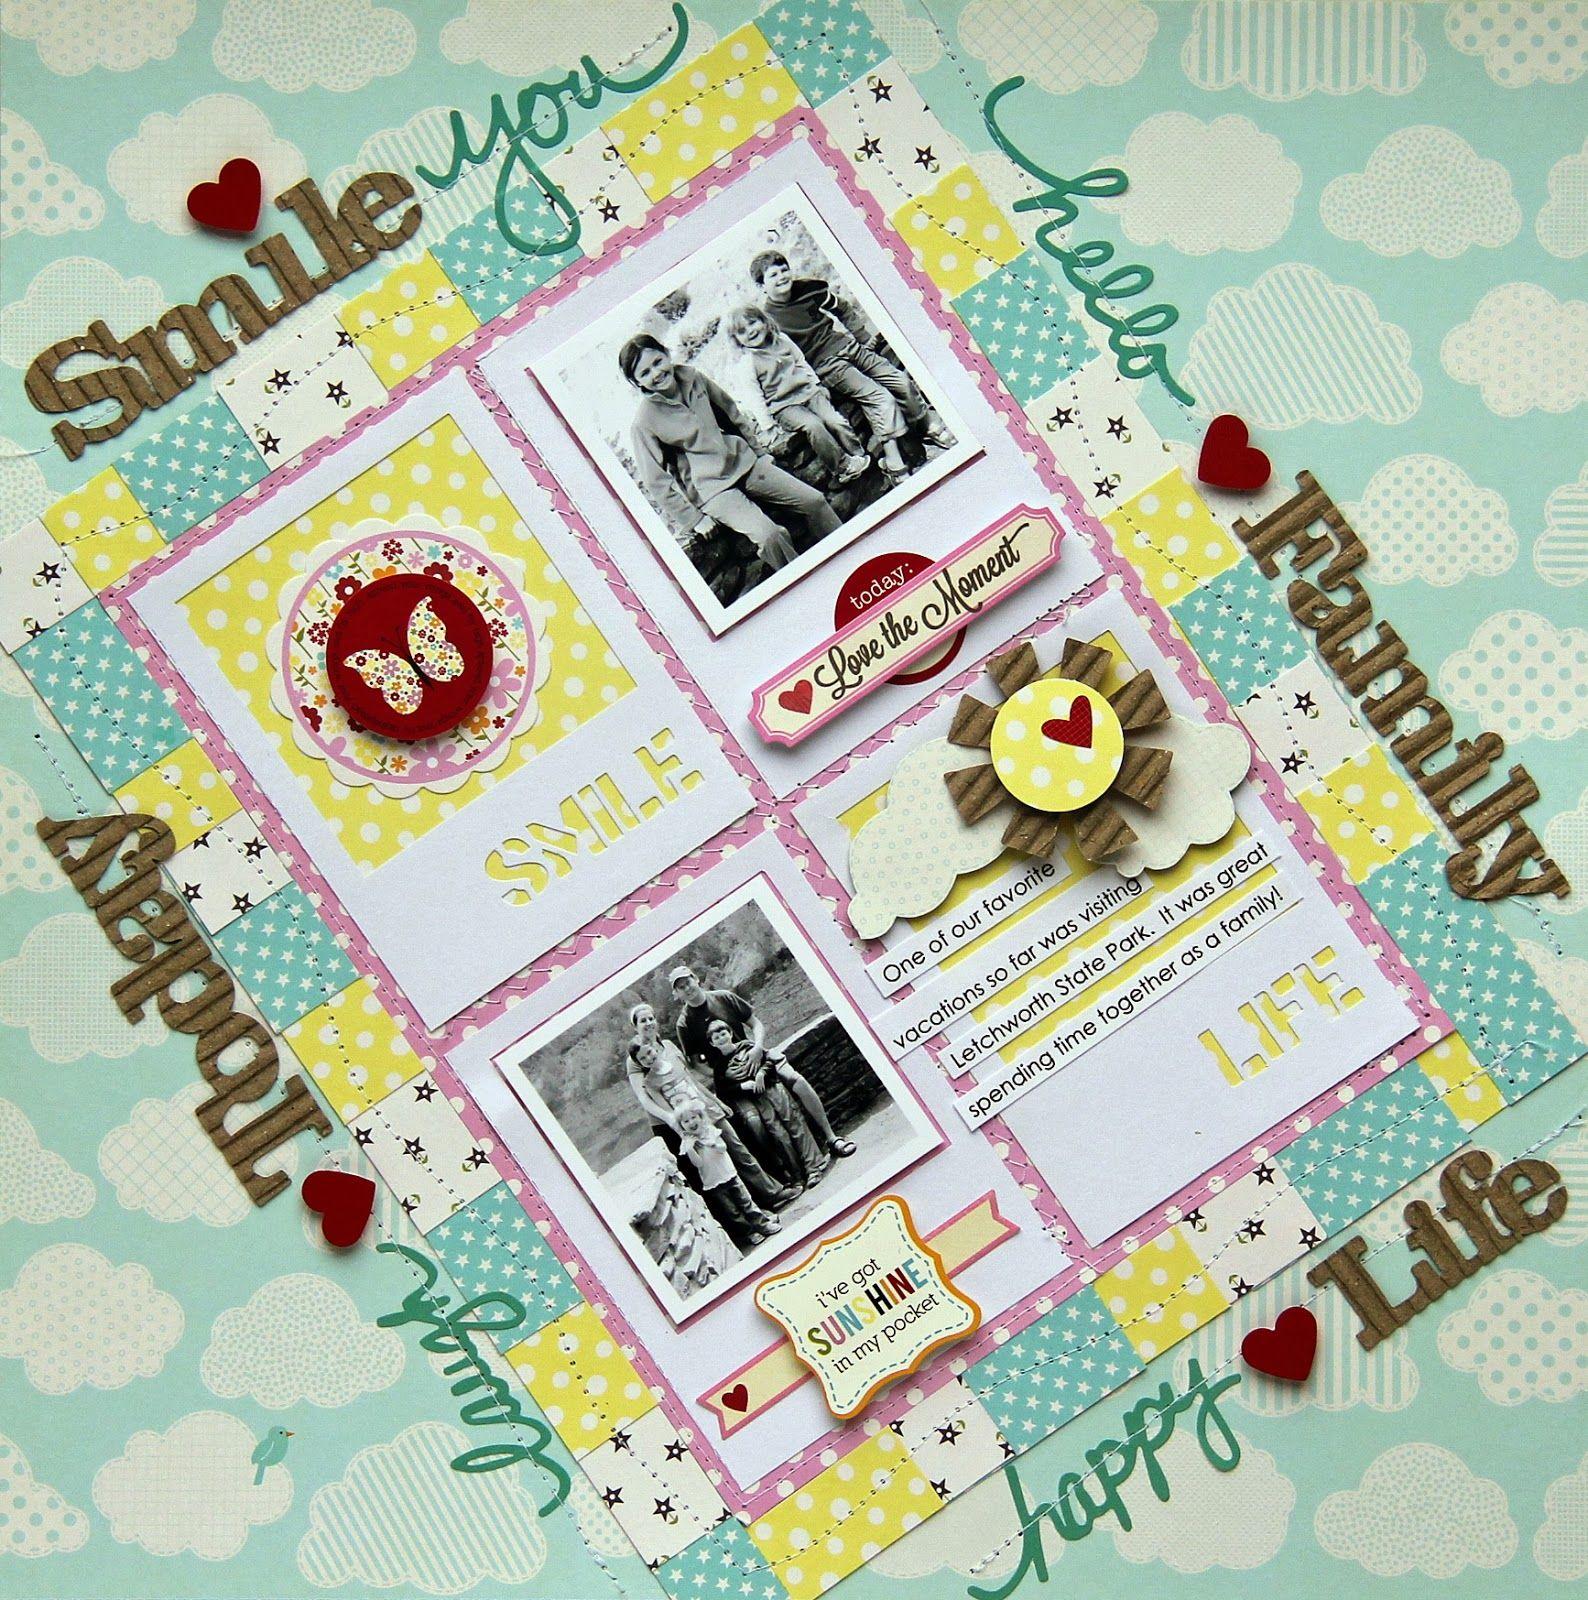 #papercraft #scrapbook #layout  Luv-a-Lot Land: A Jillibean Soup Layout by Jodi Wilton.